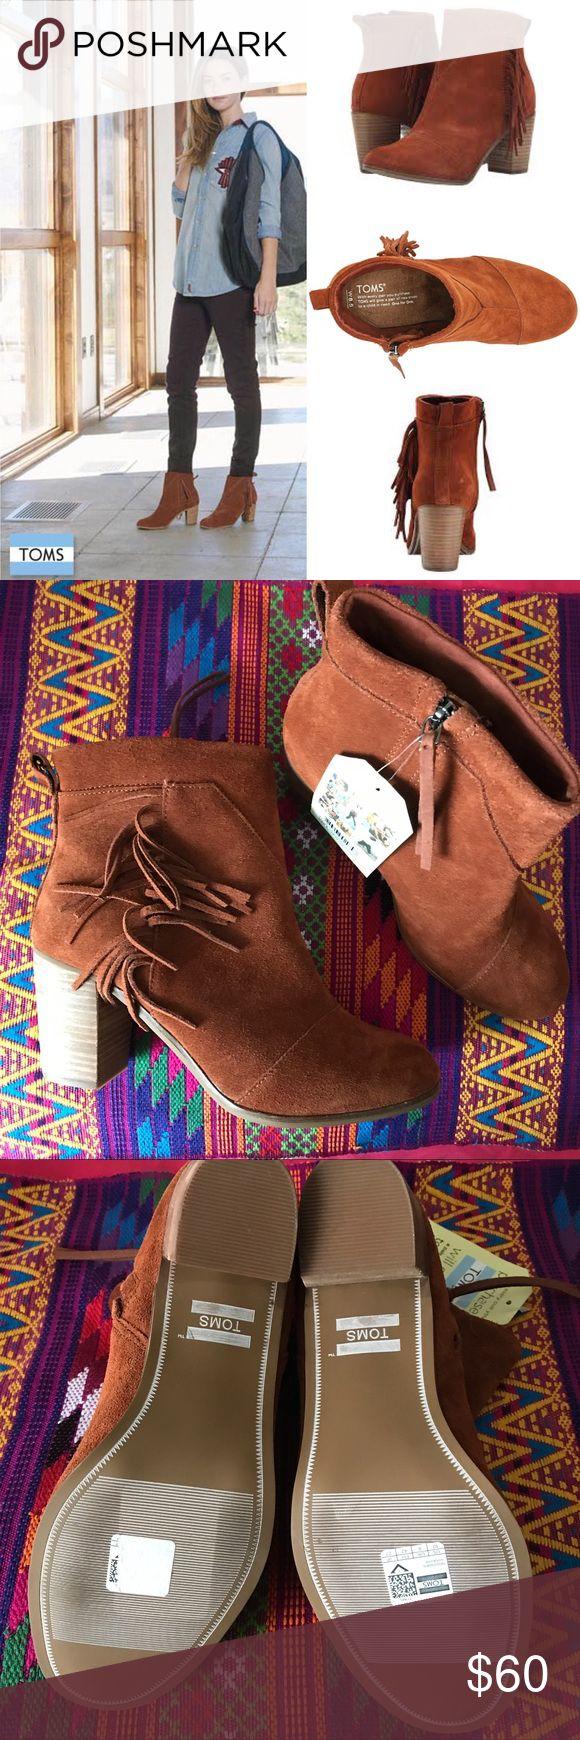 "Toms fringe booties NEW suede fringe booties, inner zipper, 2.75"" heel, TTS. Color is called cognac 👛Bundle for discount TOMS Shoes Ankle Boots & Booties"